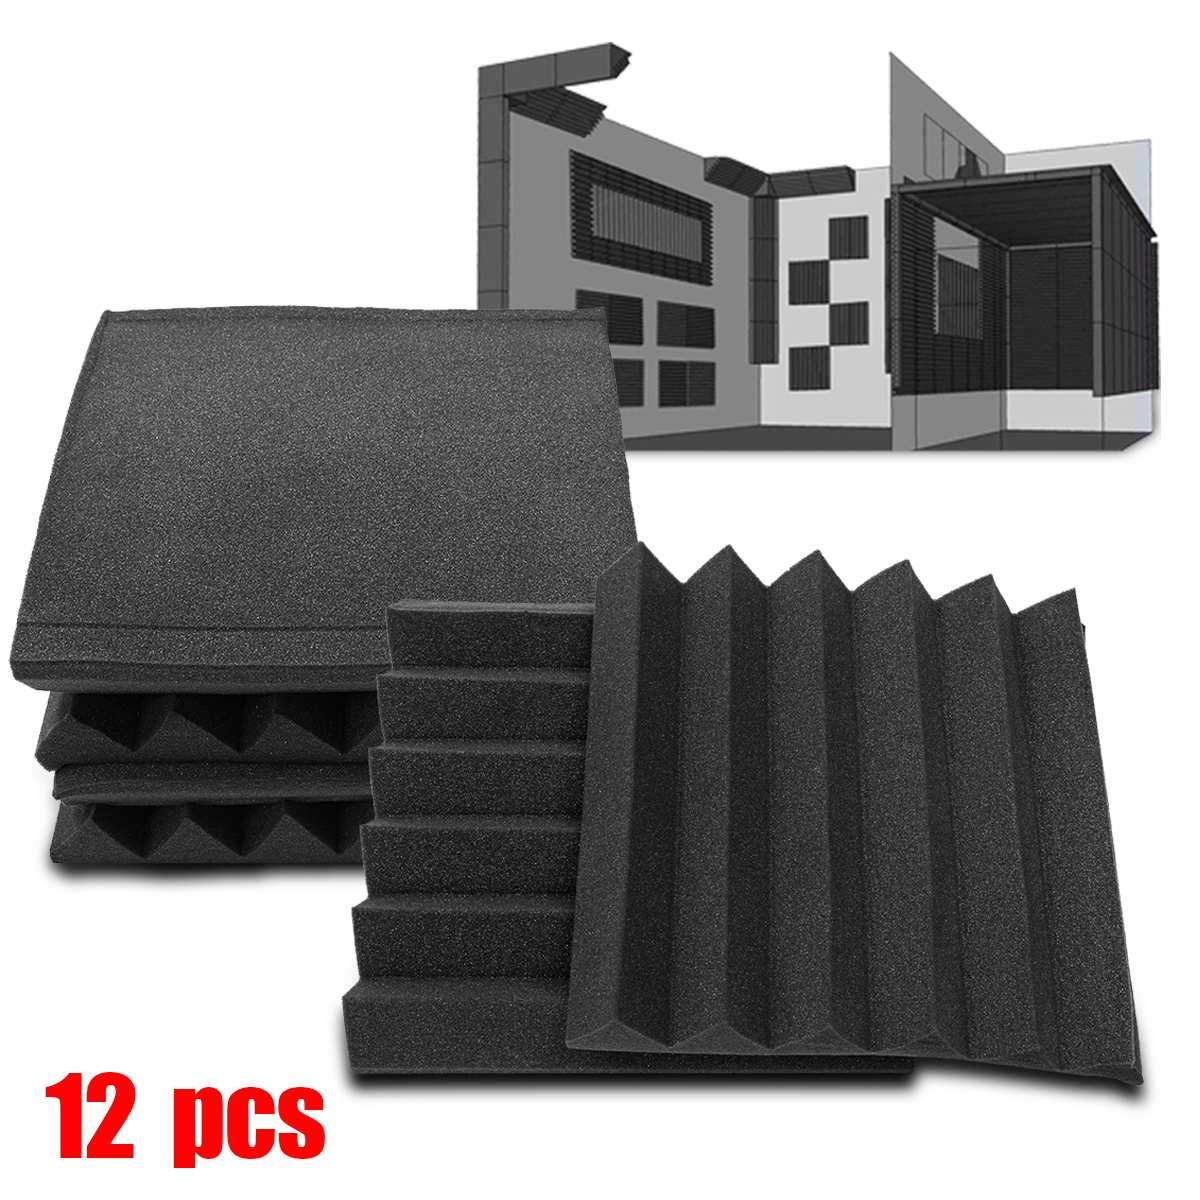 30x30cm Soundproofing Foam Acoustic Foam Sound Treatment Sound Proofing Studio Room Absorbing Wedge Tile Polyurethane Foam30x30cm Soundproofing Foam Acoustic Foam Sound Treatment Sound Proofing Studio Room Absorbing Wedge Tile Polyurethane Foam